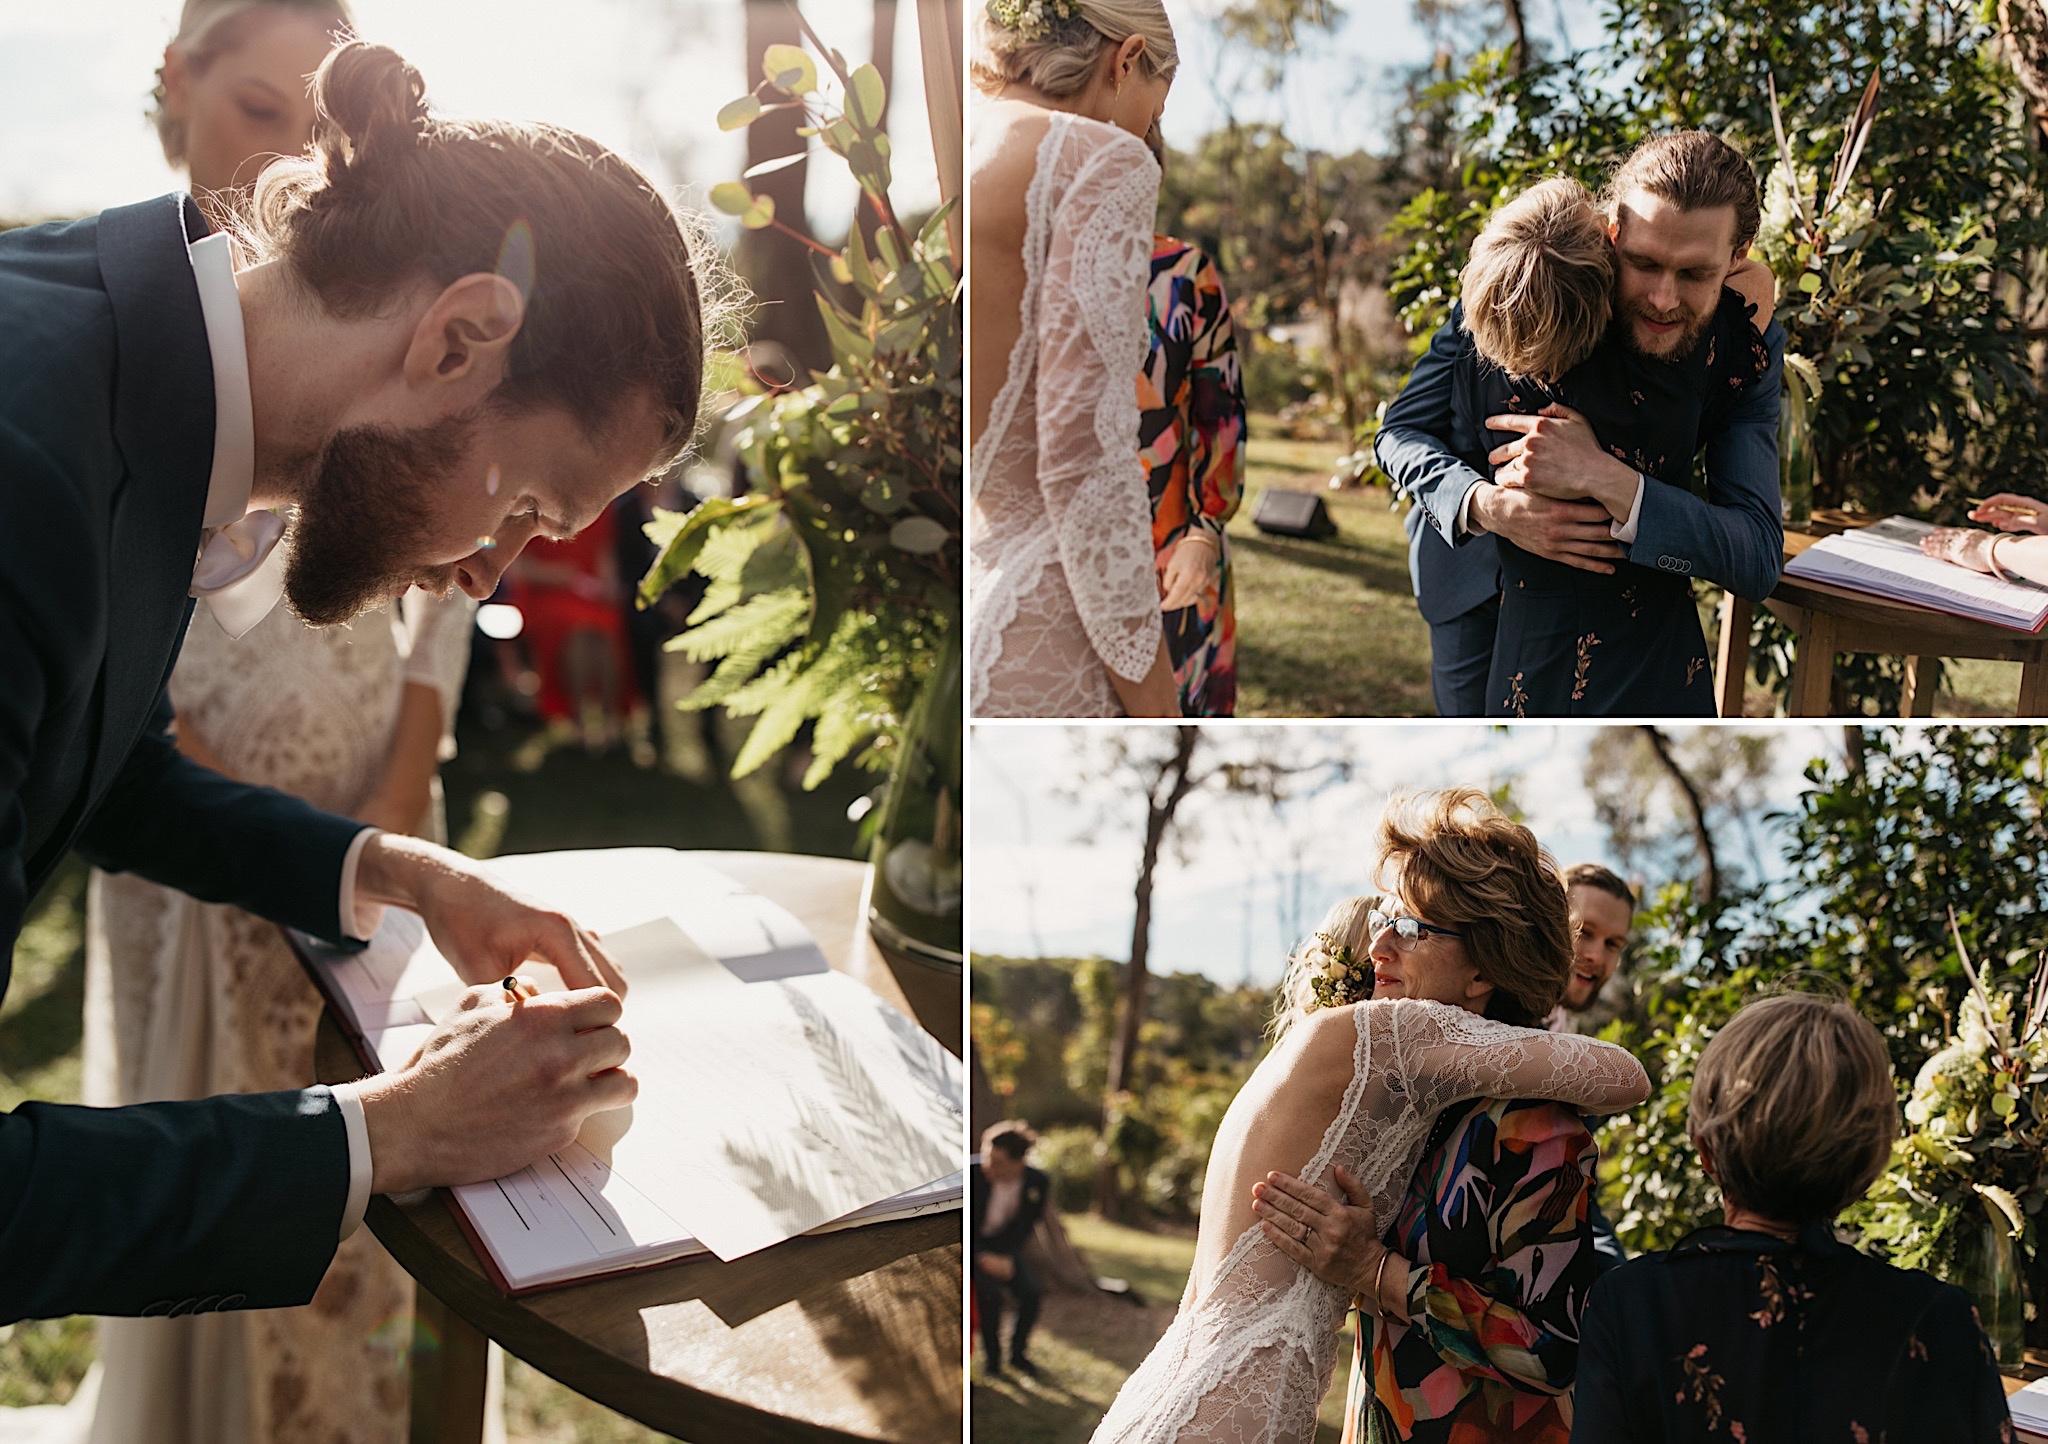 048_SBA-Jen-Tom-Wedding-153_SBA-Jen-Tom-Wedding-154_SBA-Jen-Tom-Wedding-158.jpg